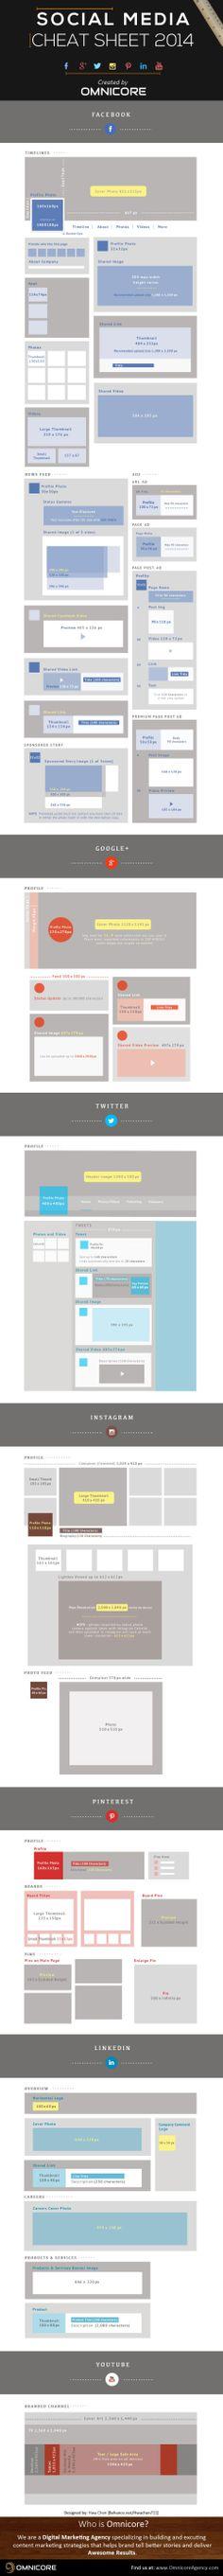 Ultimative-Social-Media-Cheat-Sheet